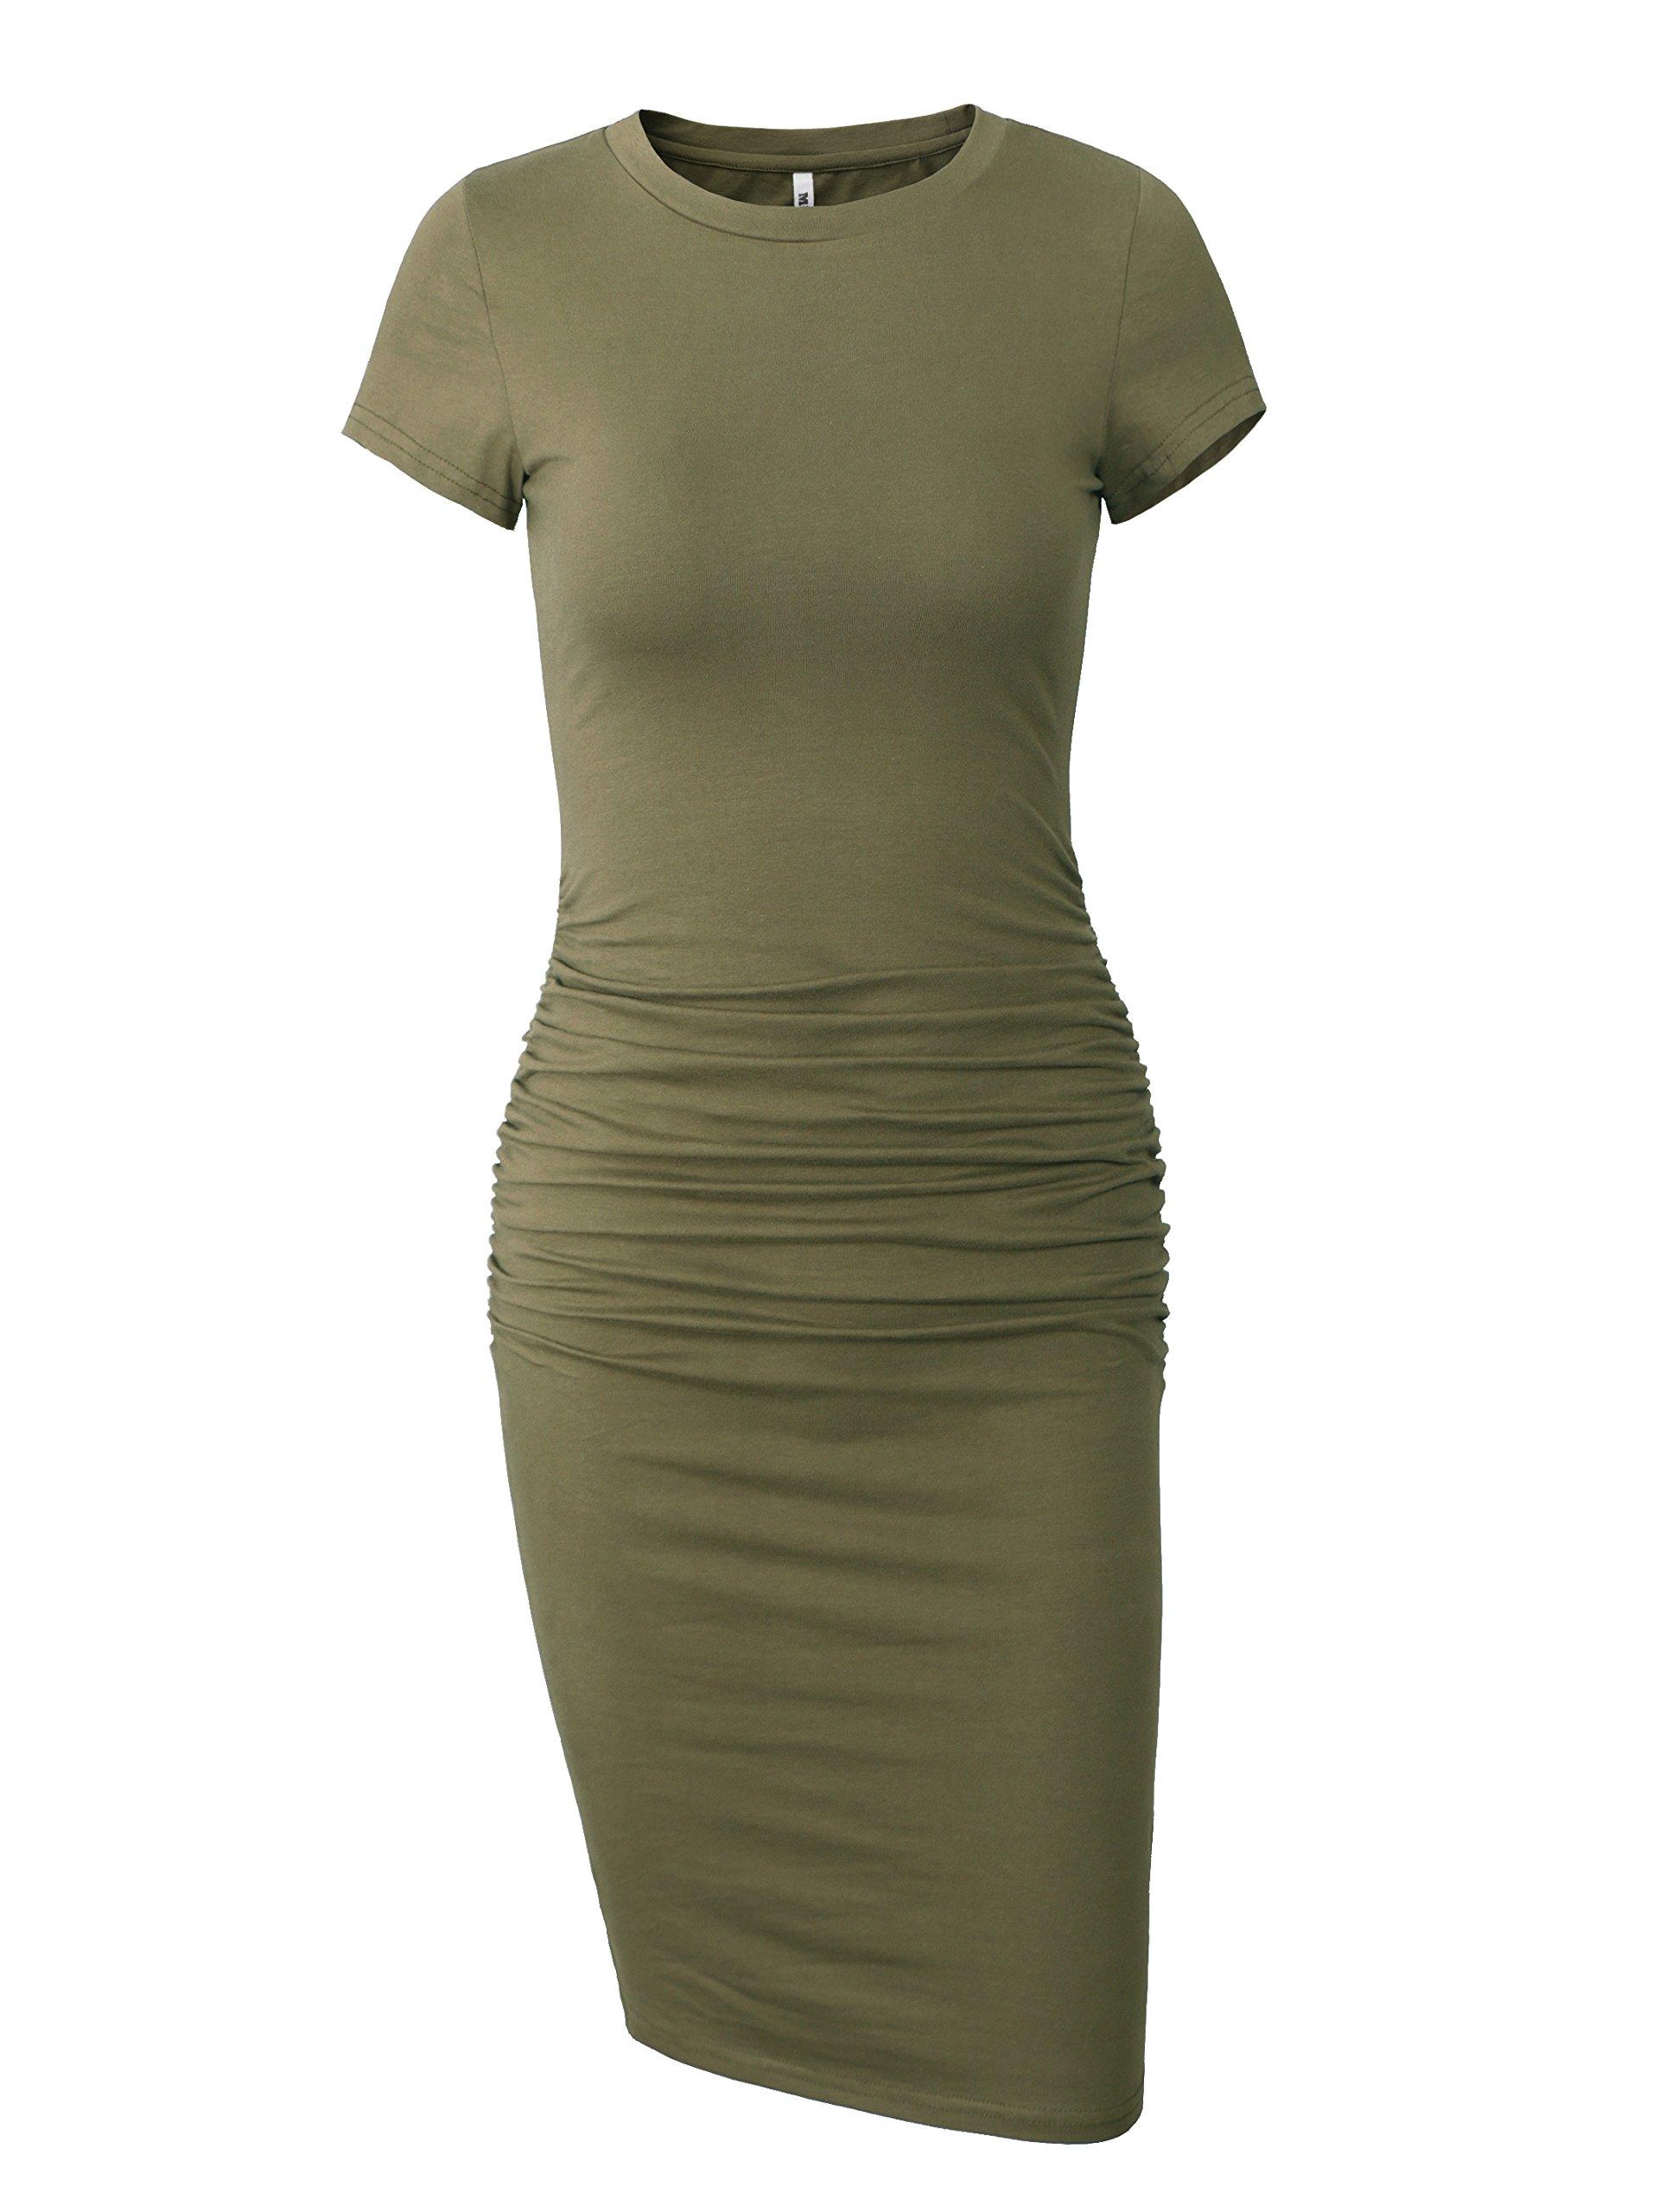 Missufe Women's Ruched Casual Sundress Midi Bodycon Sheath Dress (Army Green, Medium)